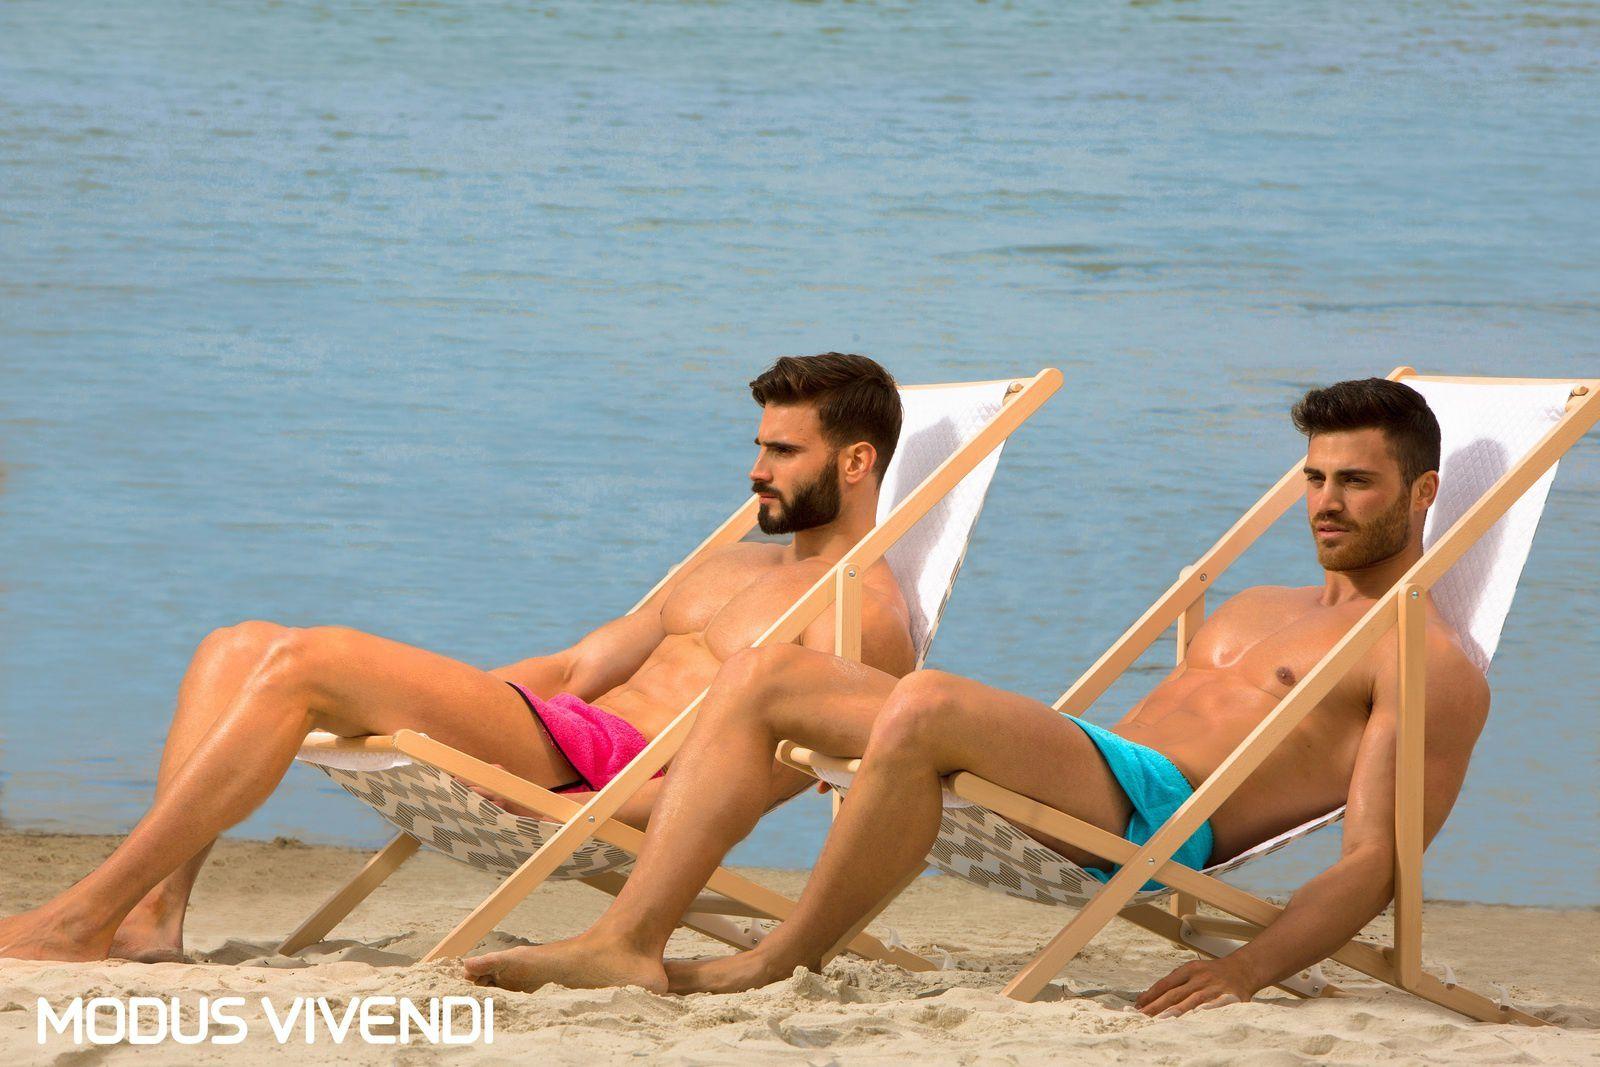 ModusVivendi - Swimwear 2016 - Towel Line